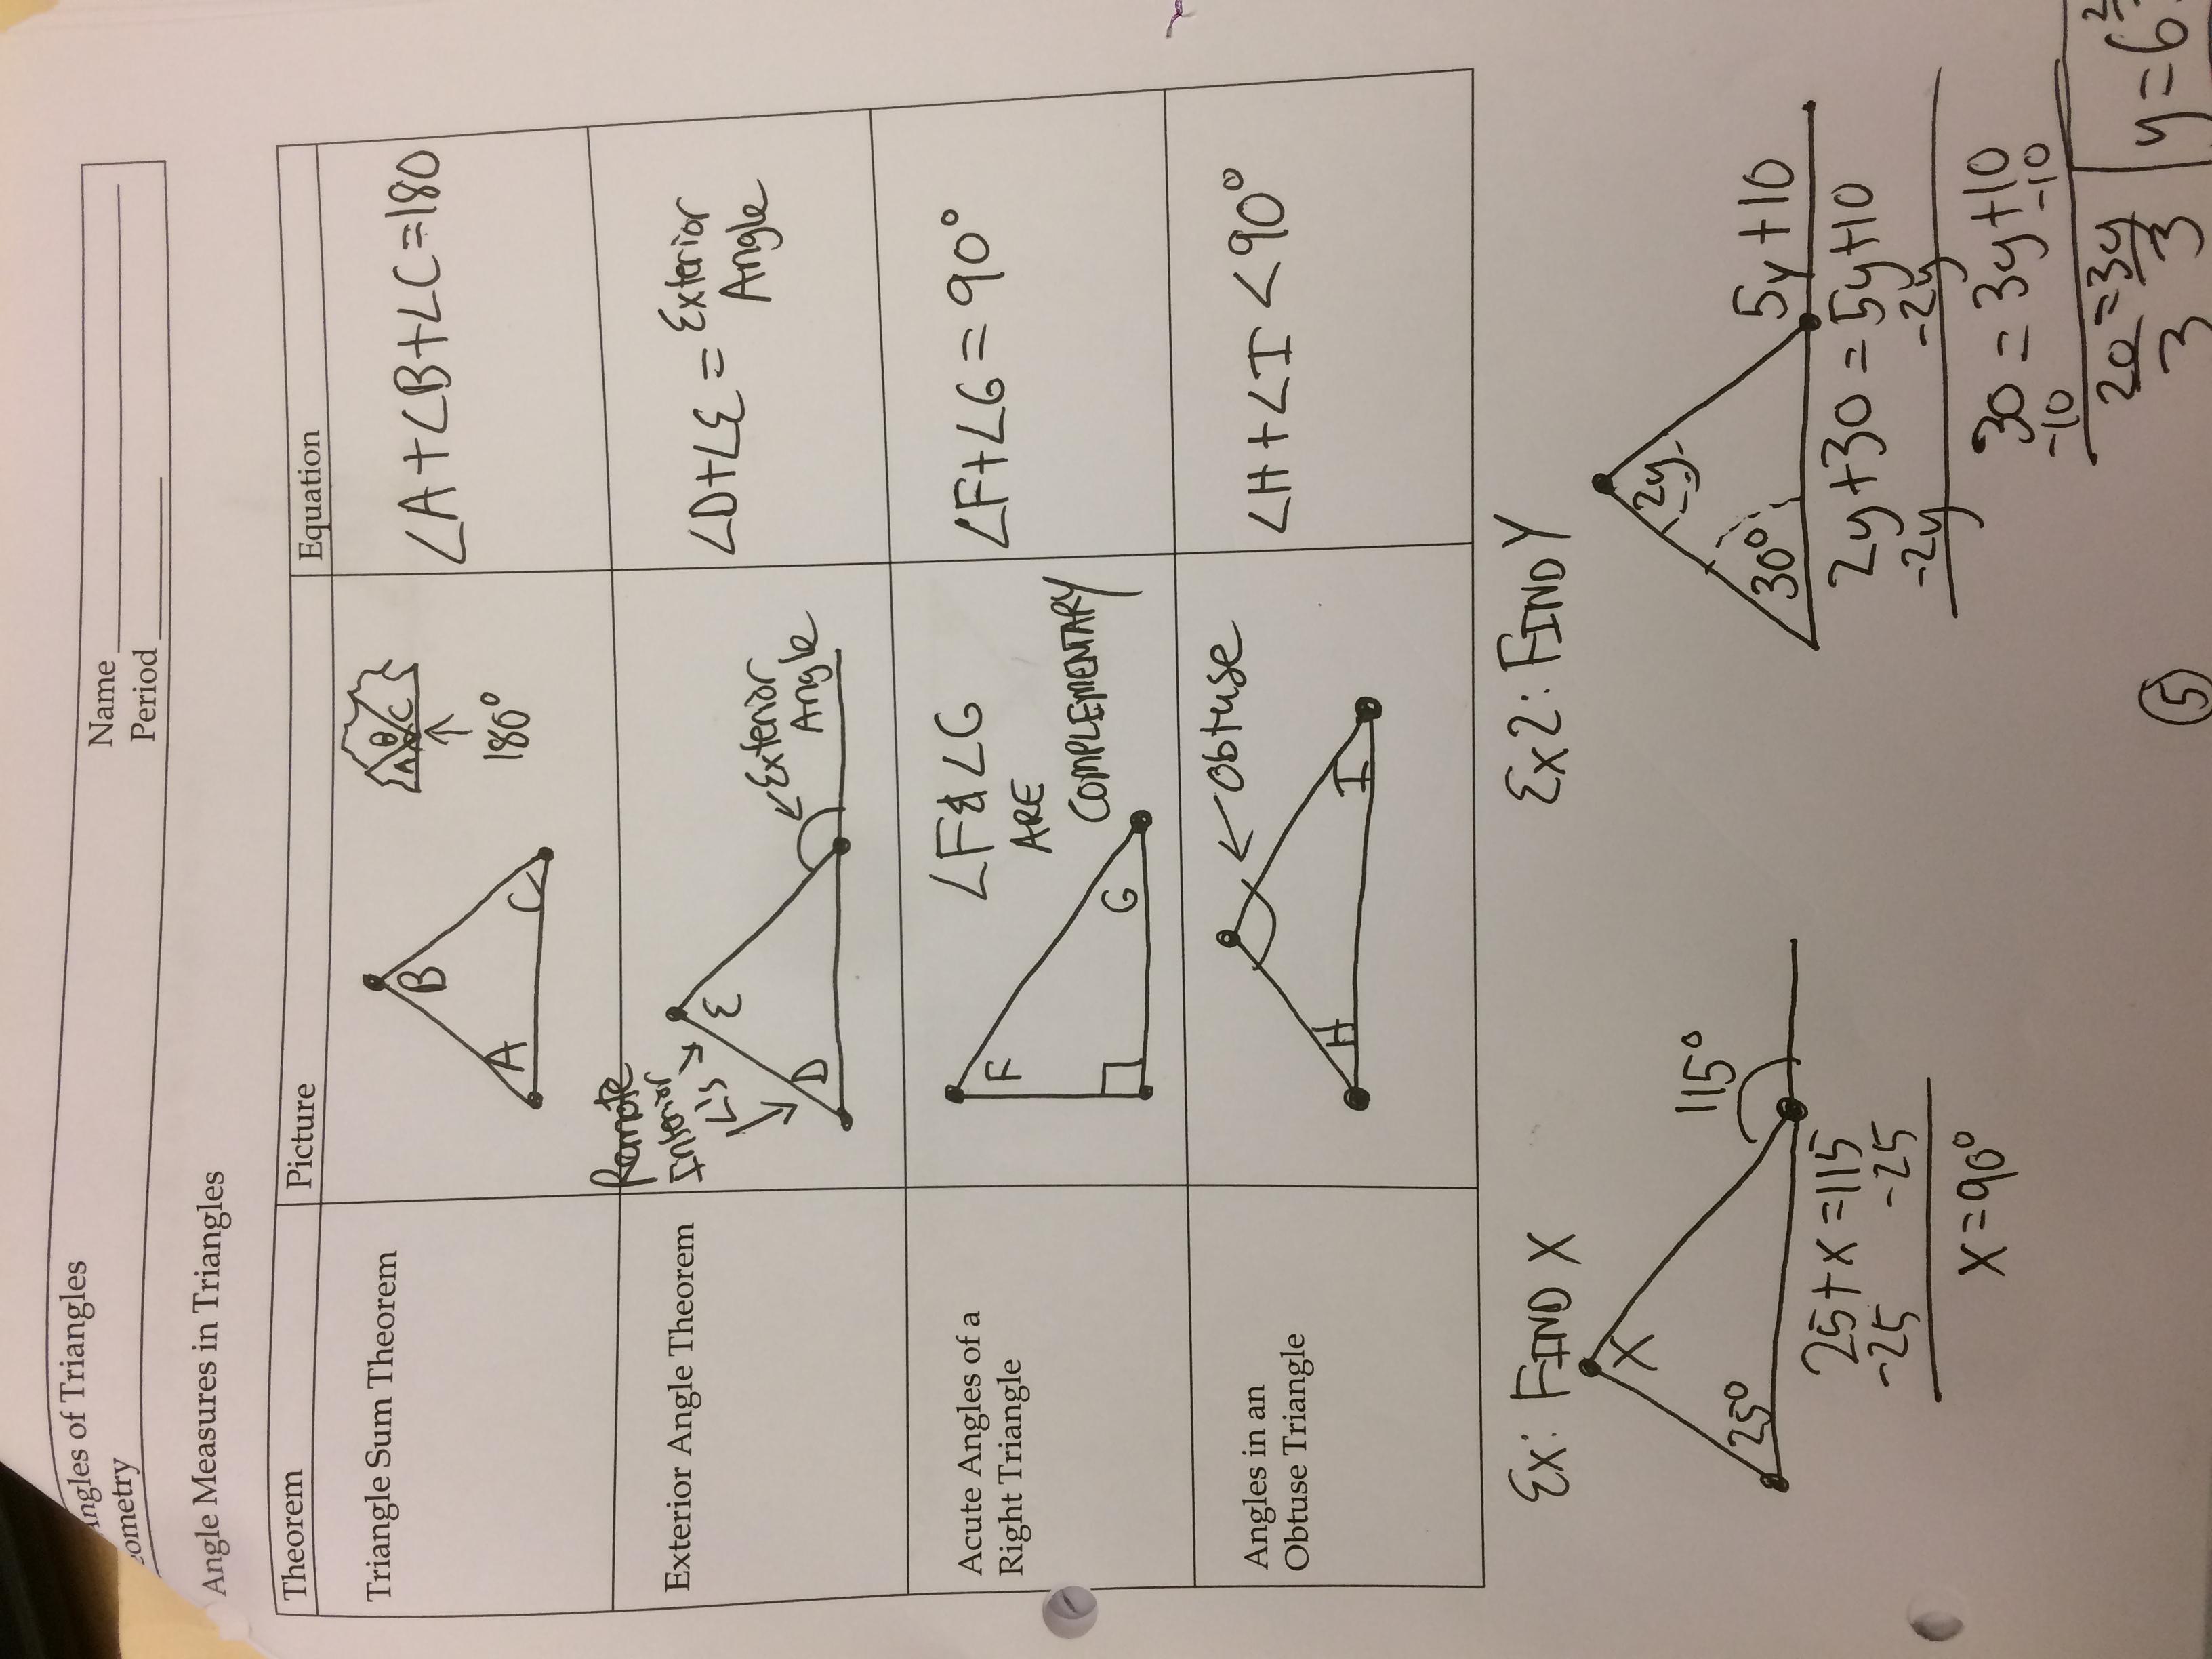 Classnotes Class 9 Notes Maths Congruent Triangles